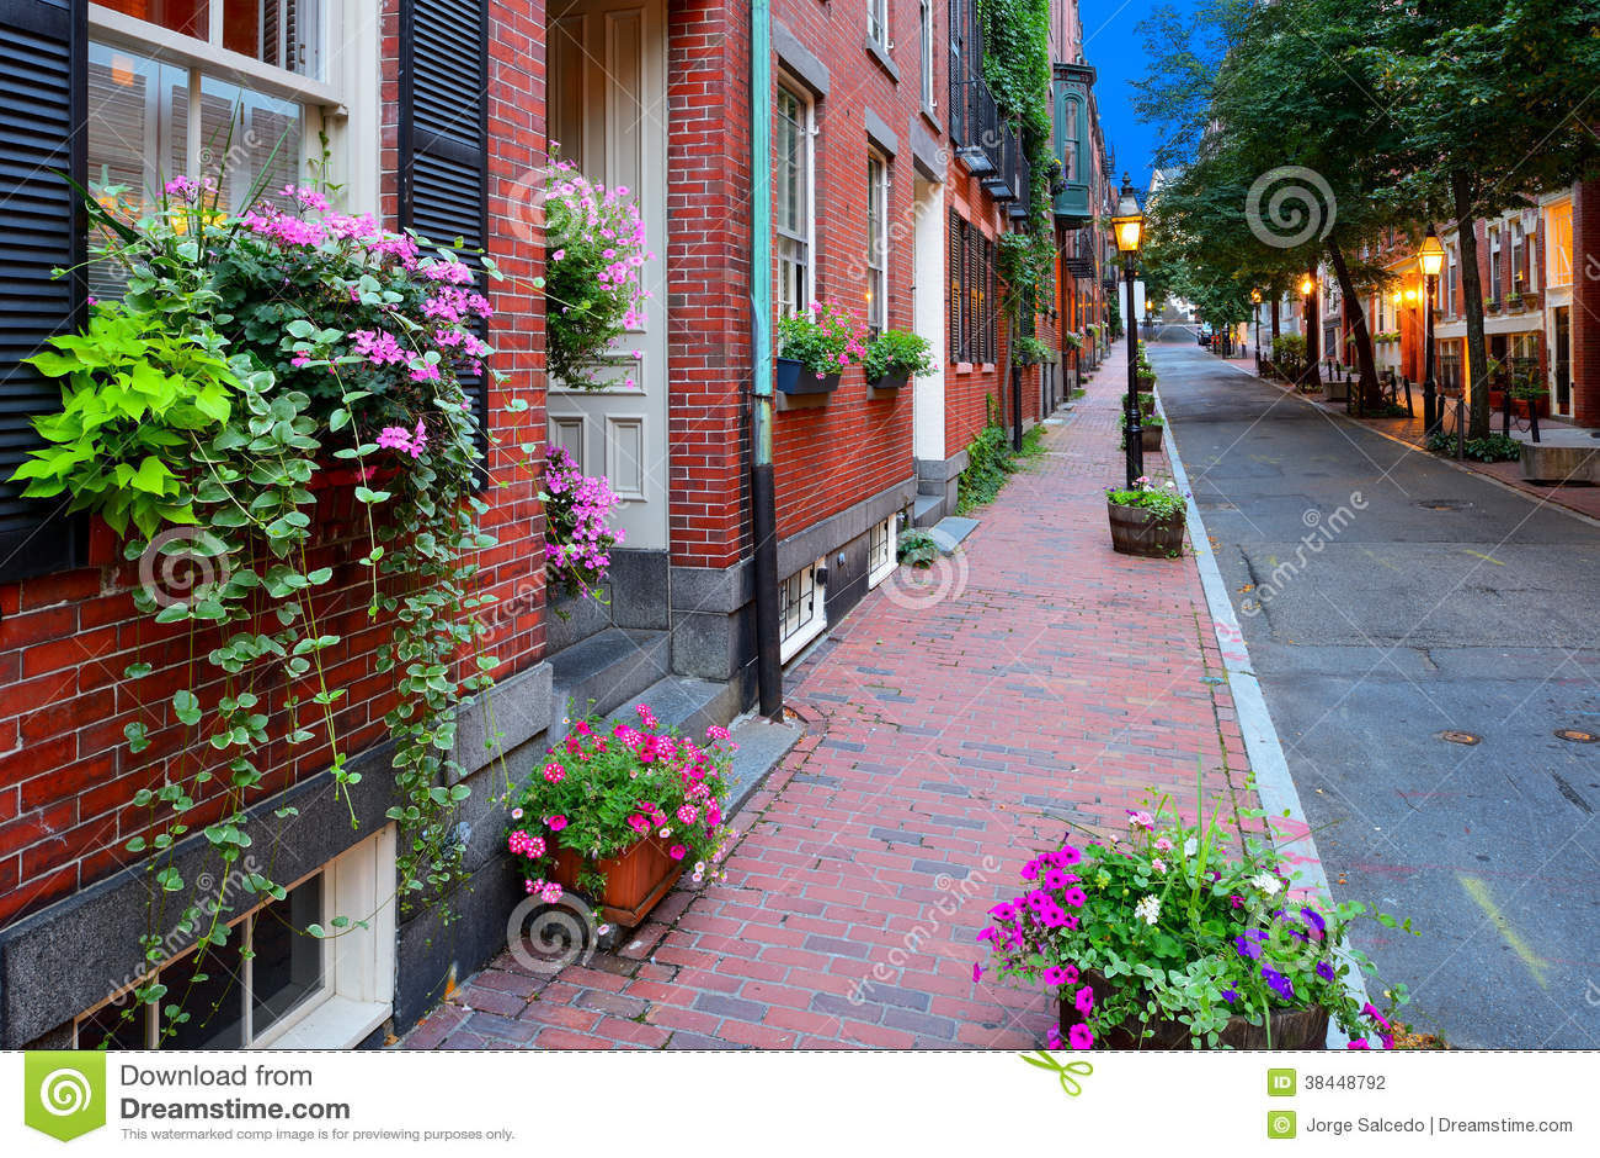 Boston Streetscape At Night Stock Photo Image Of Hanging